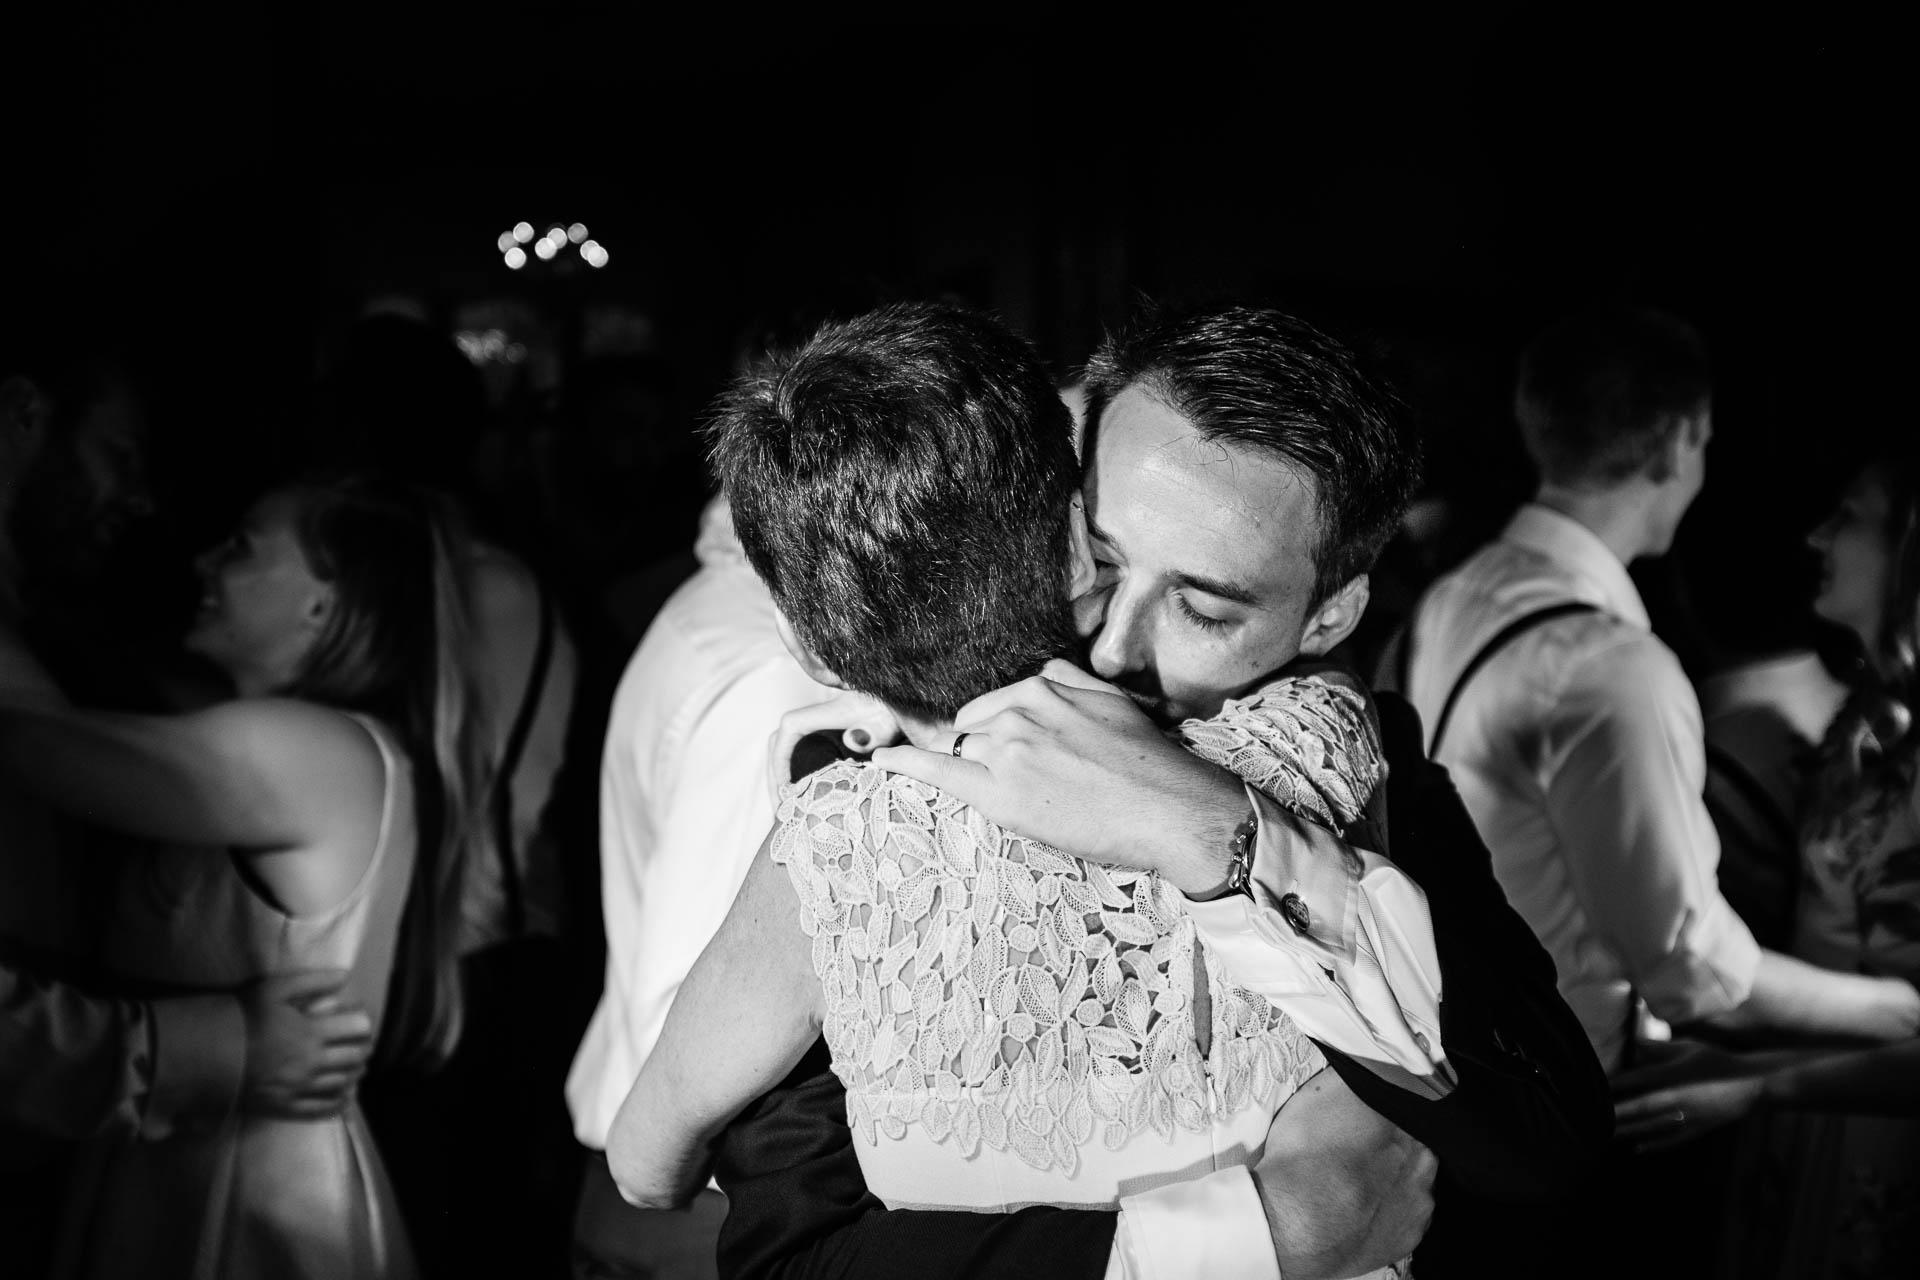 orchardleigh house wedding - Danni & Barney (502).jpg